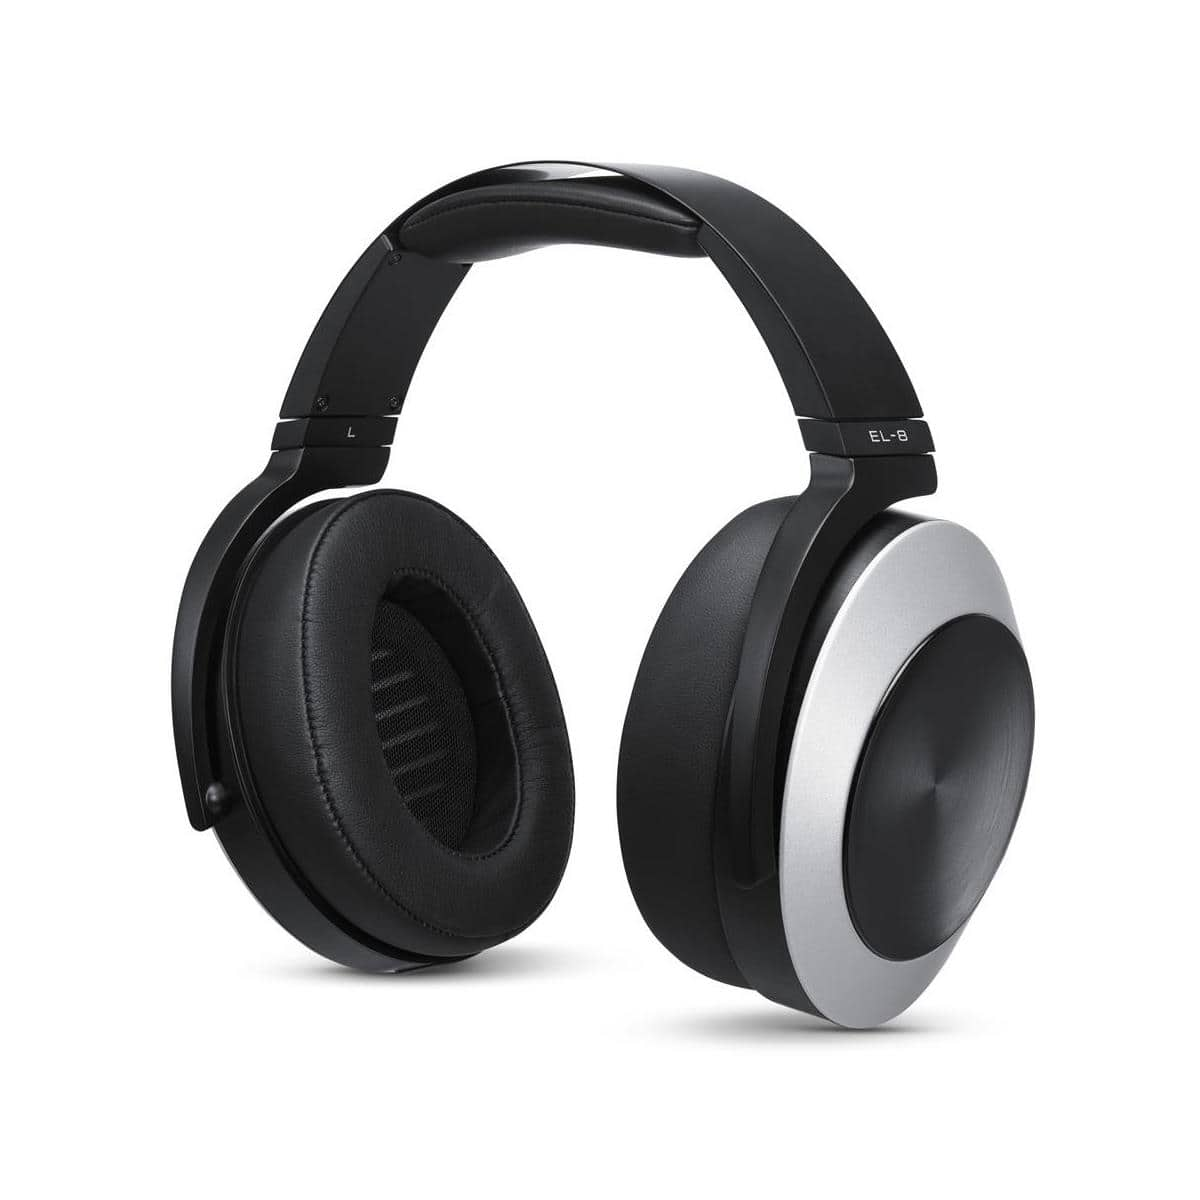 Audeze EL-8 Titanium Planar Magnetic Closed Headphones w/ Cypher Cable $499 + free shipping